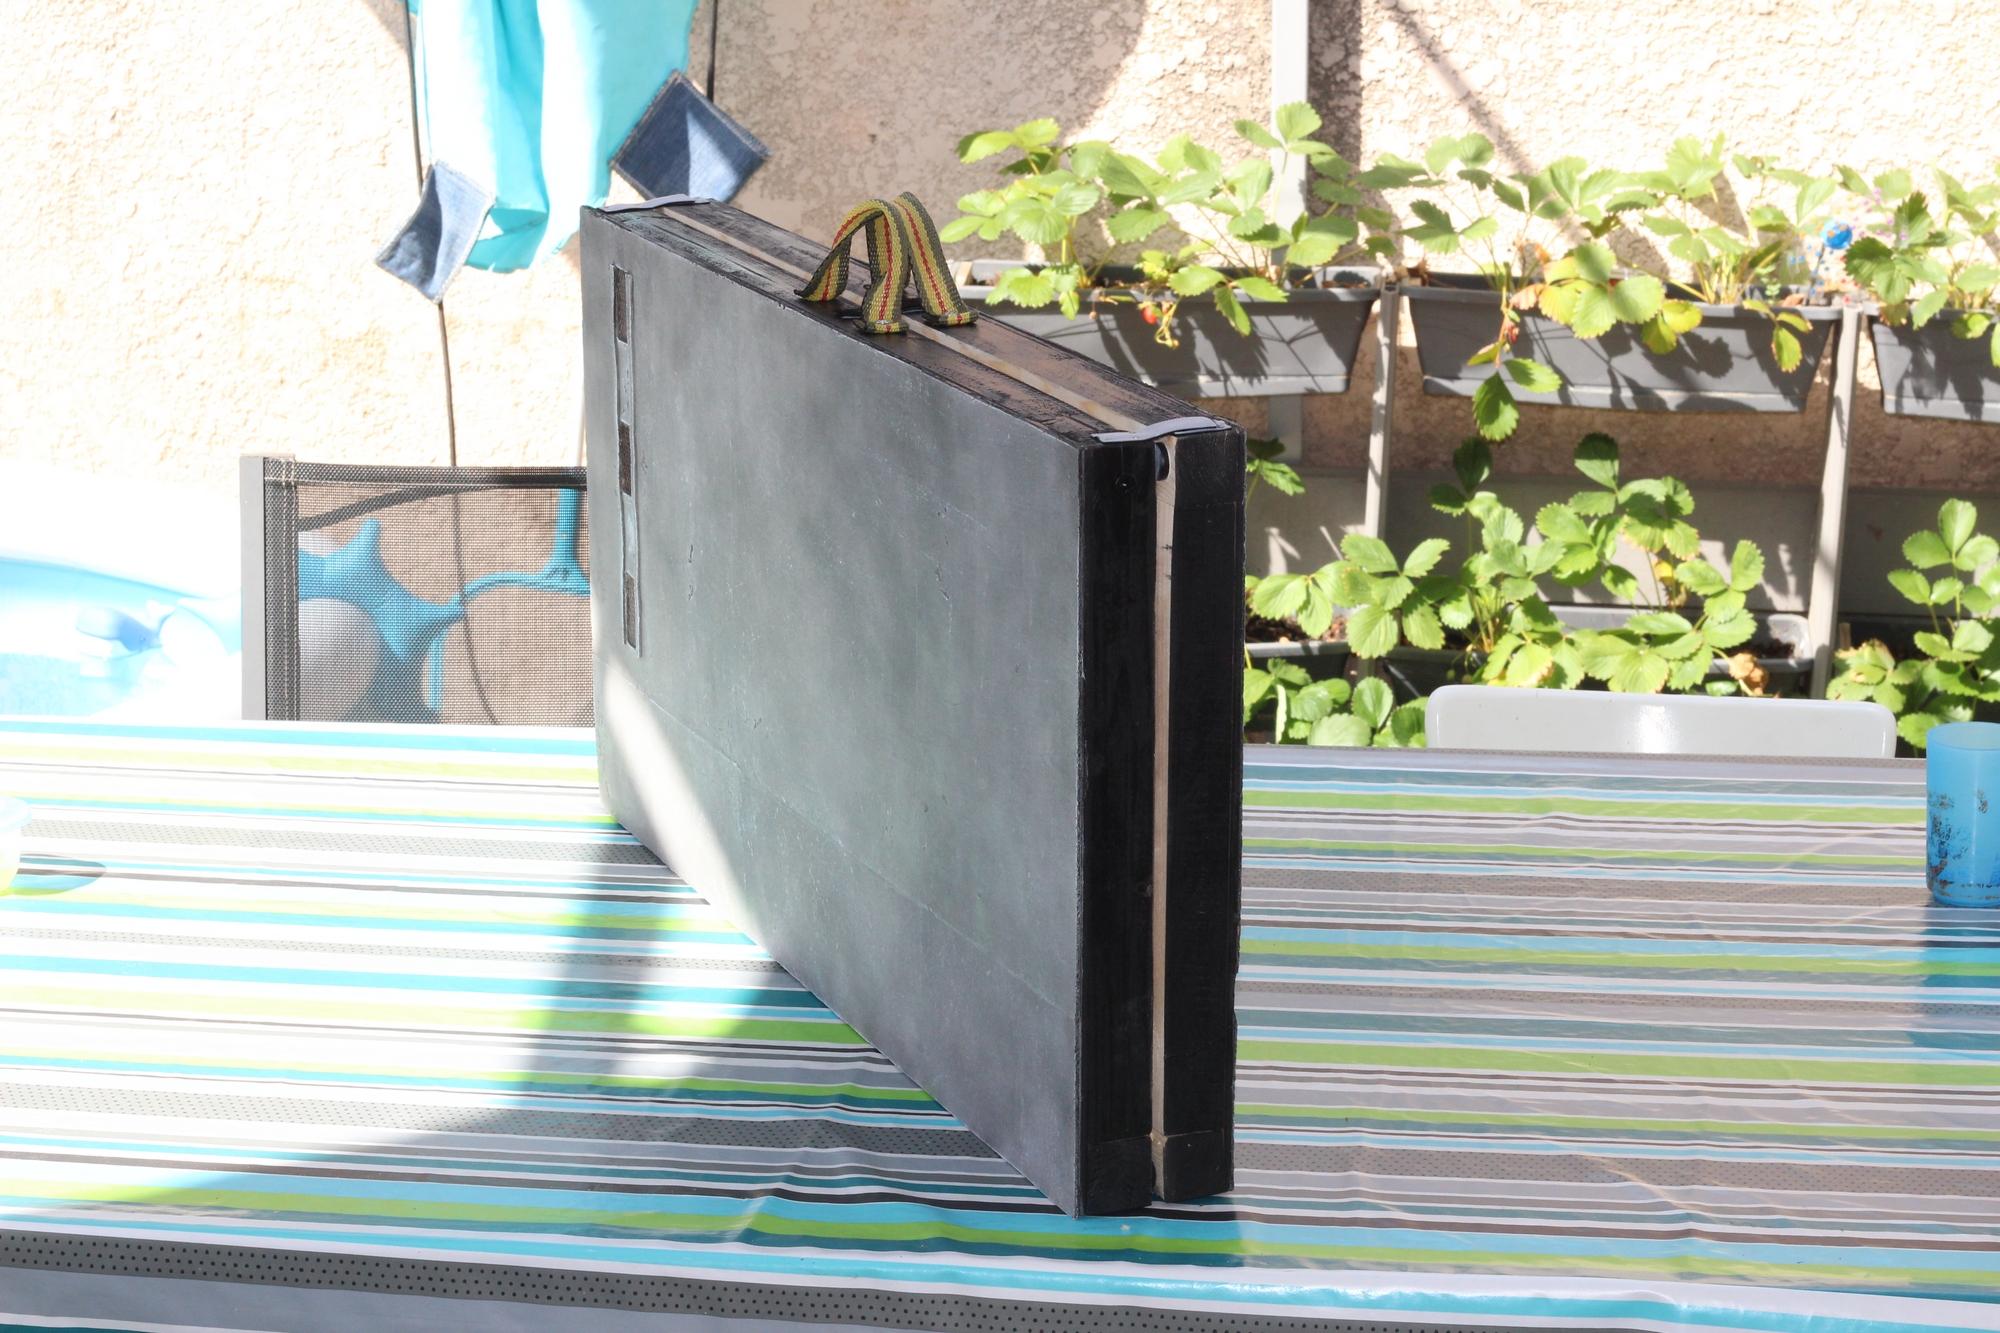 table modulable/portable petite escarmouche Img_7975-4fc1114